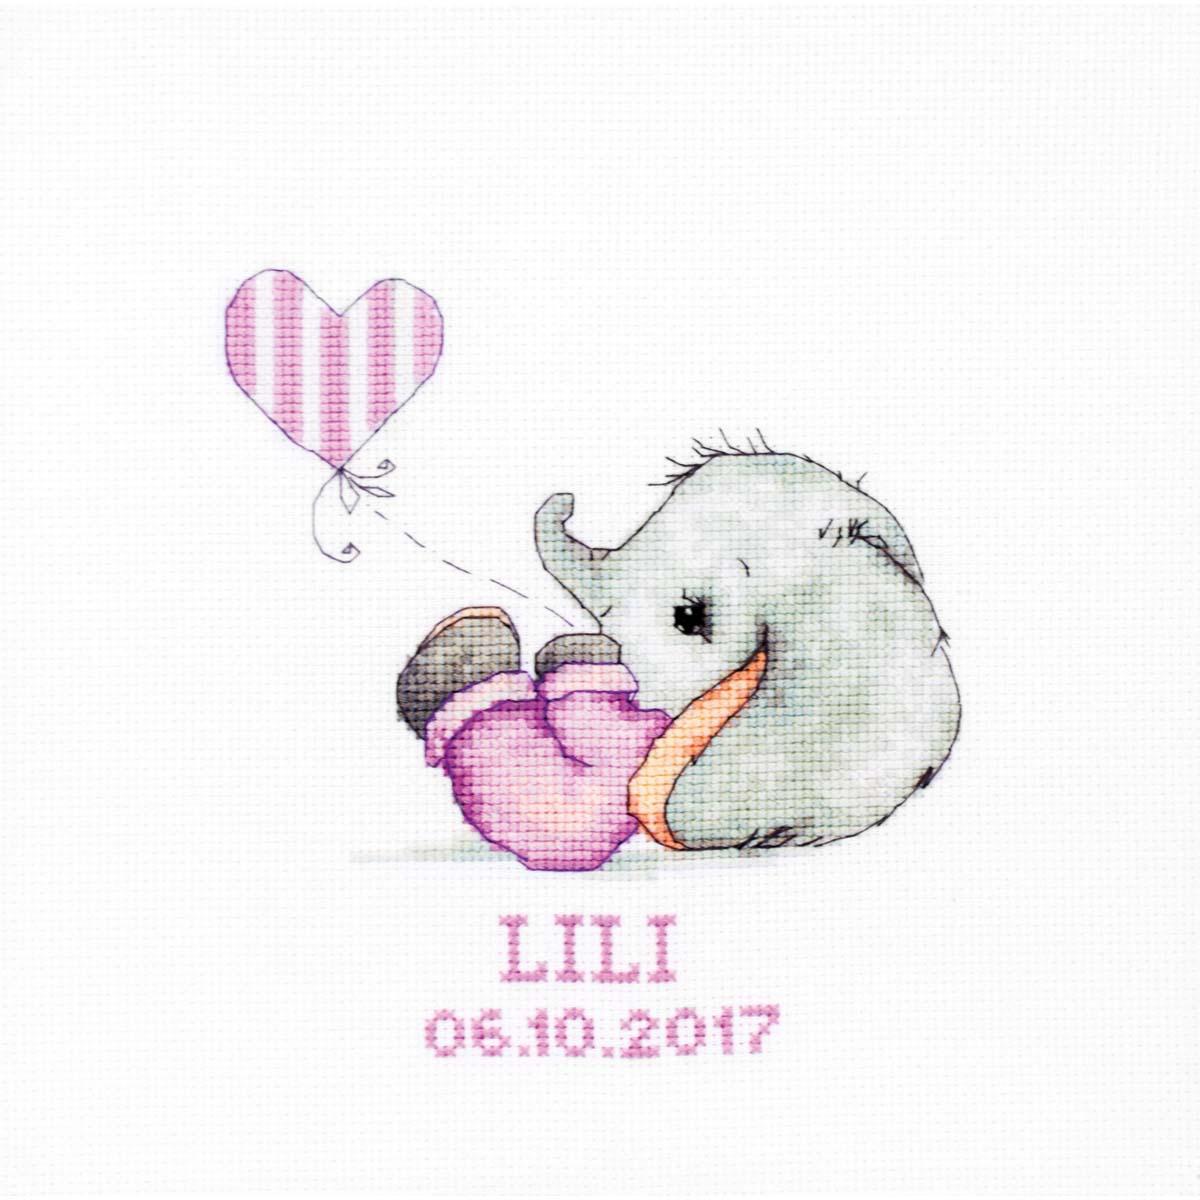 B1133 Набор для вышивания Luca-S 'Baby girl' 14*15,5 см